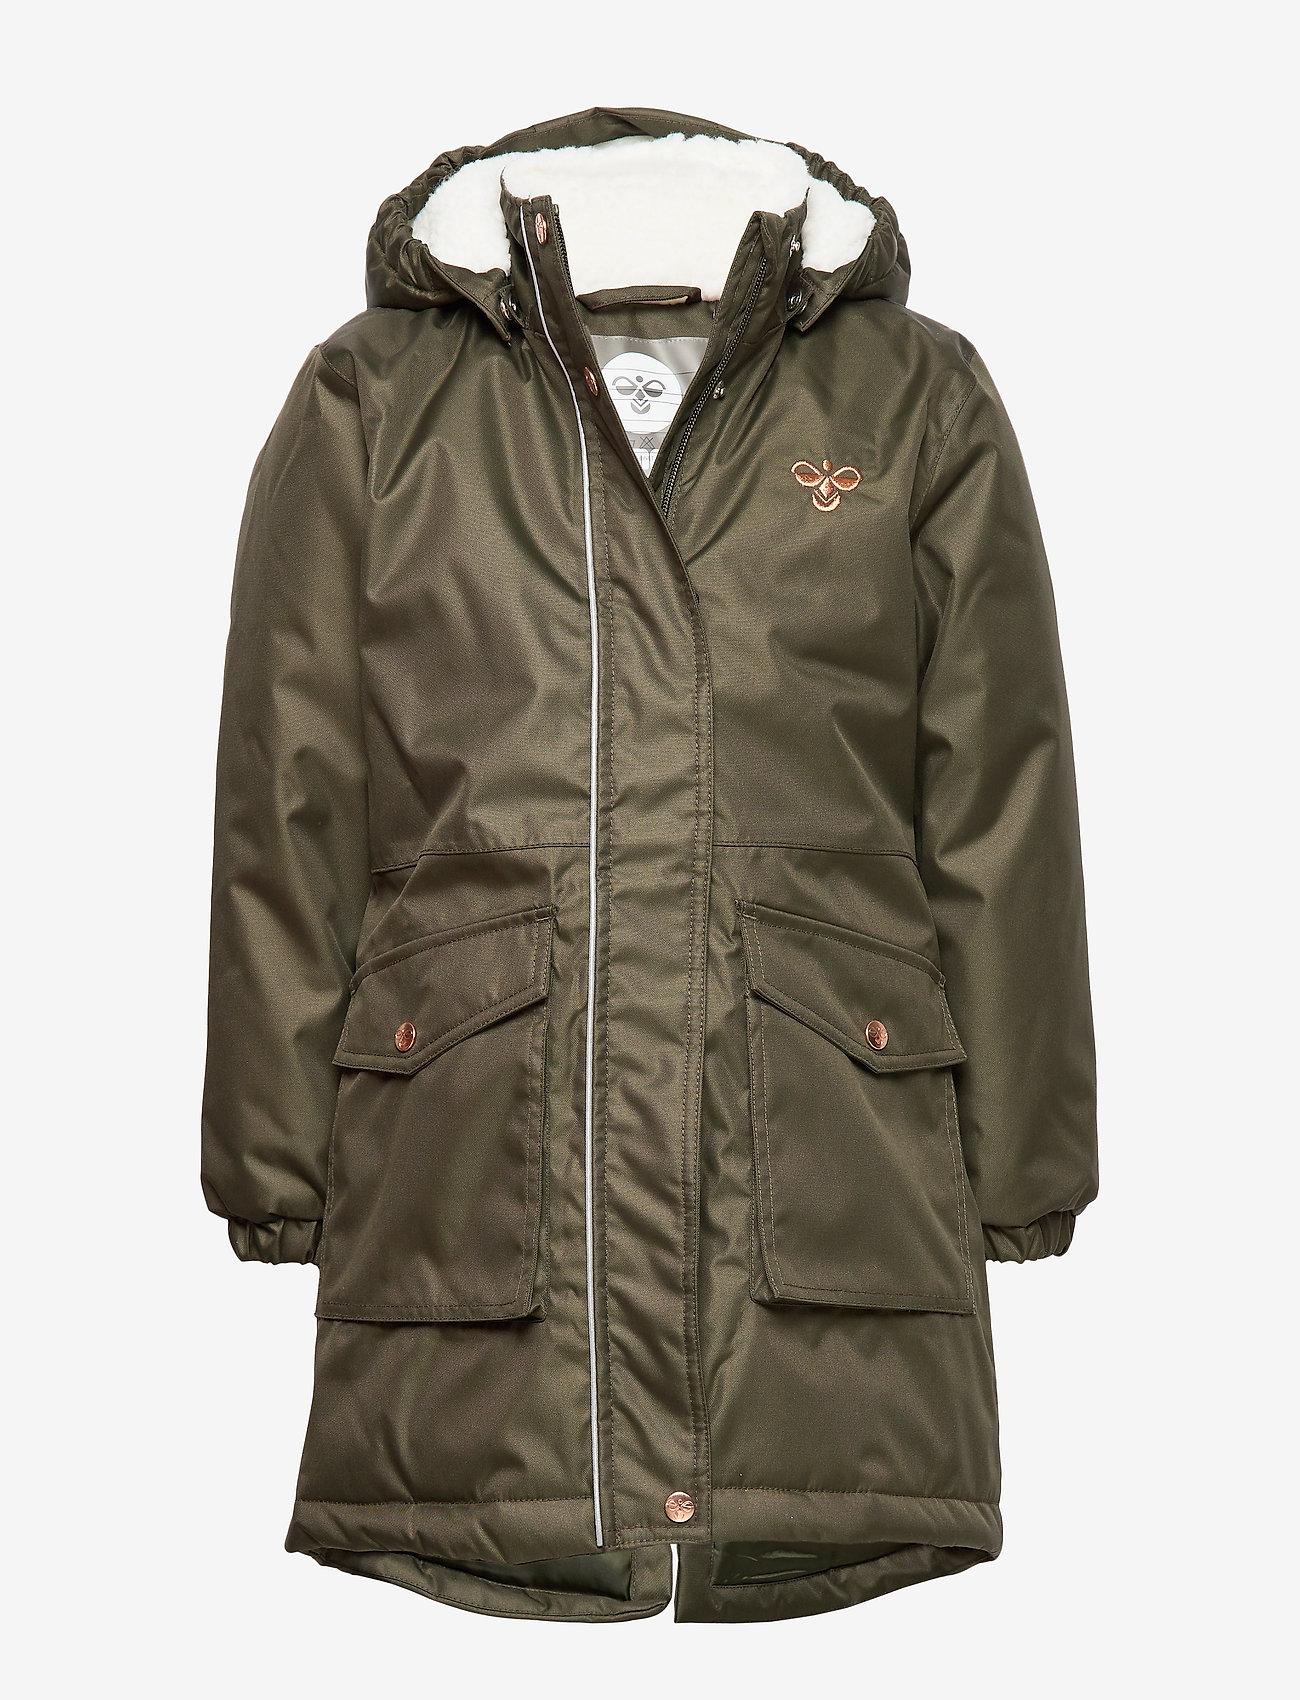 Hummel - hmlLISE COAT - insulated jackets - forest night - 0